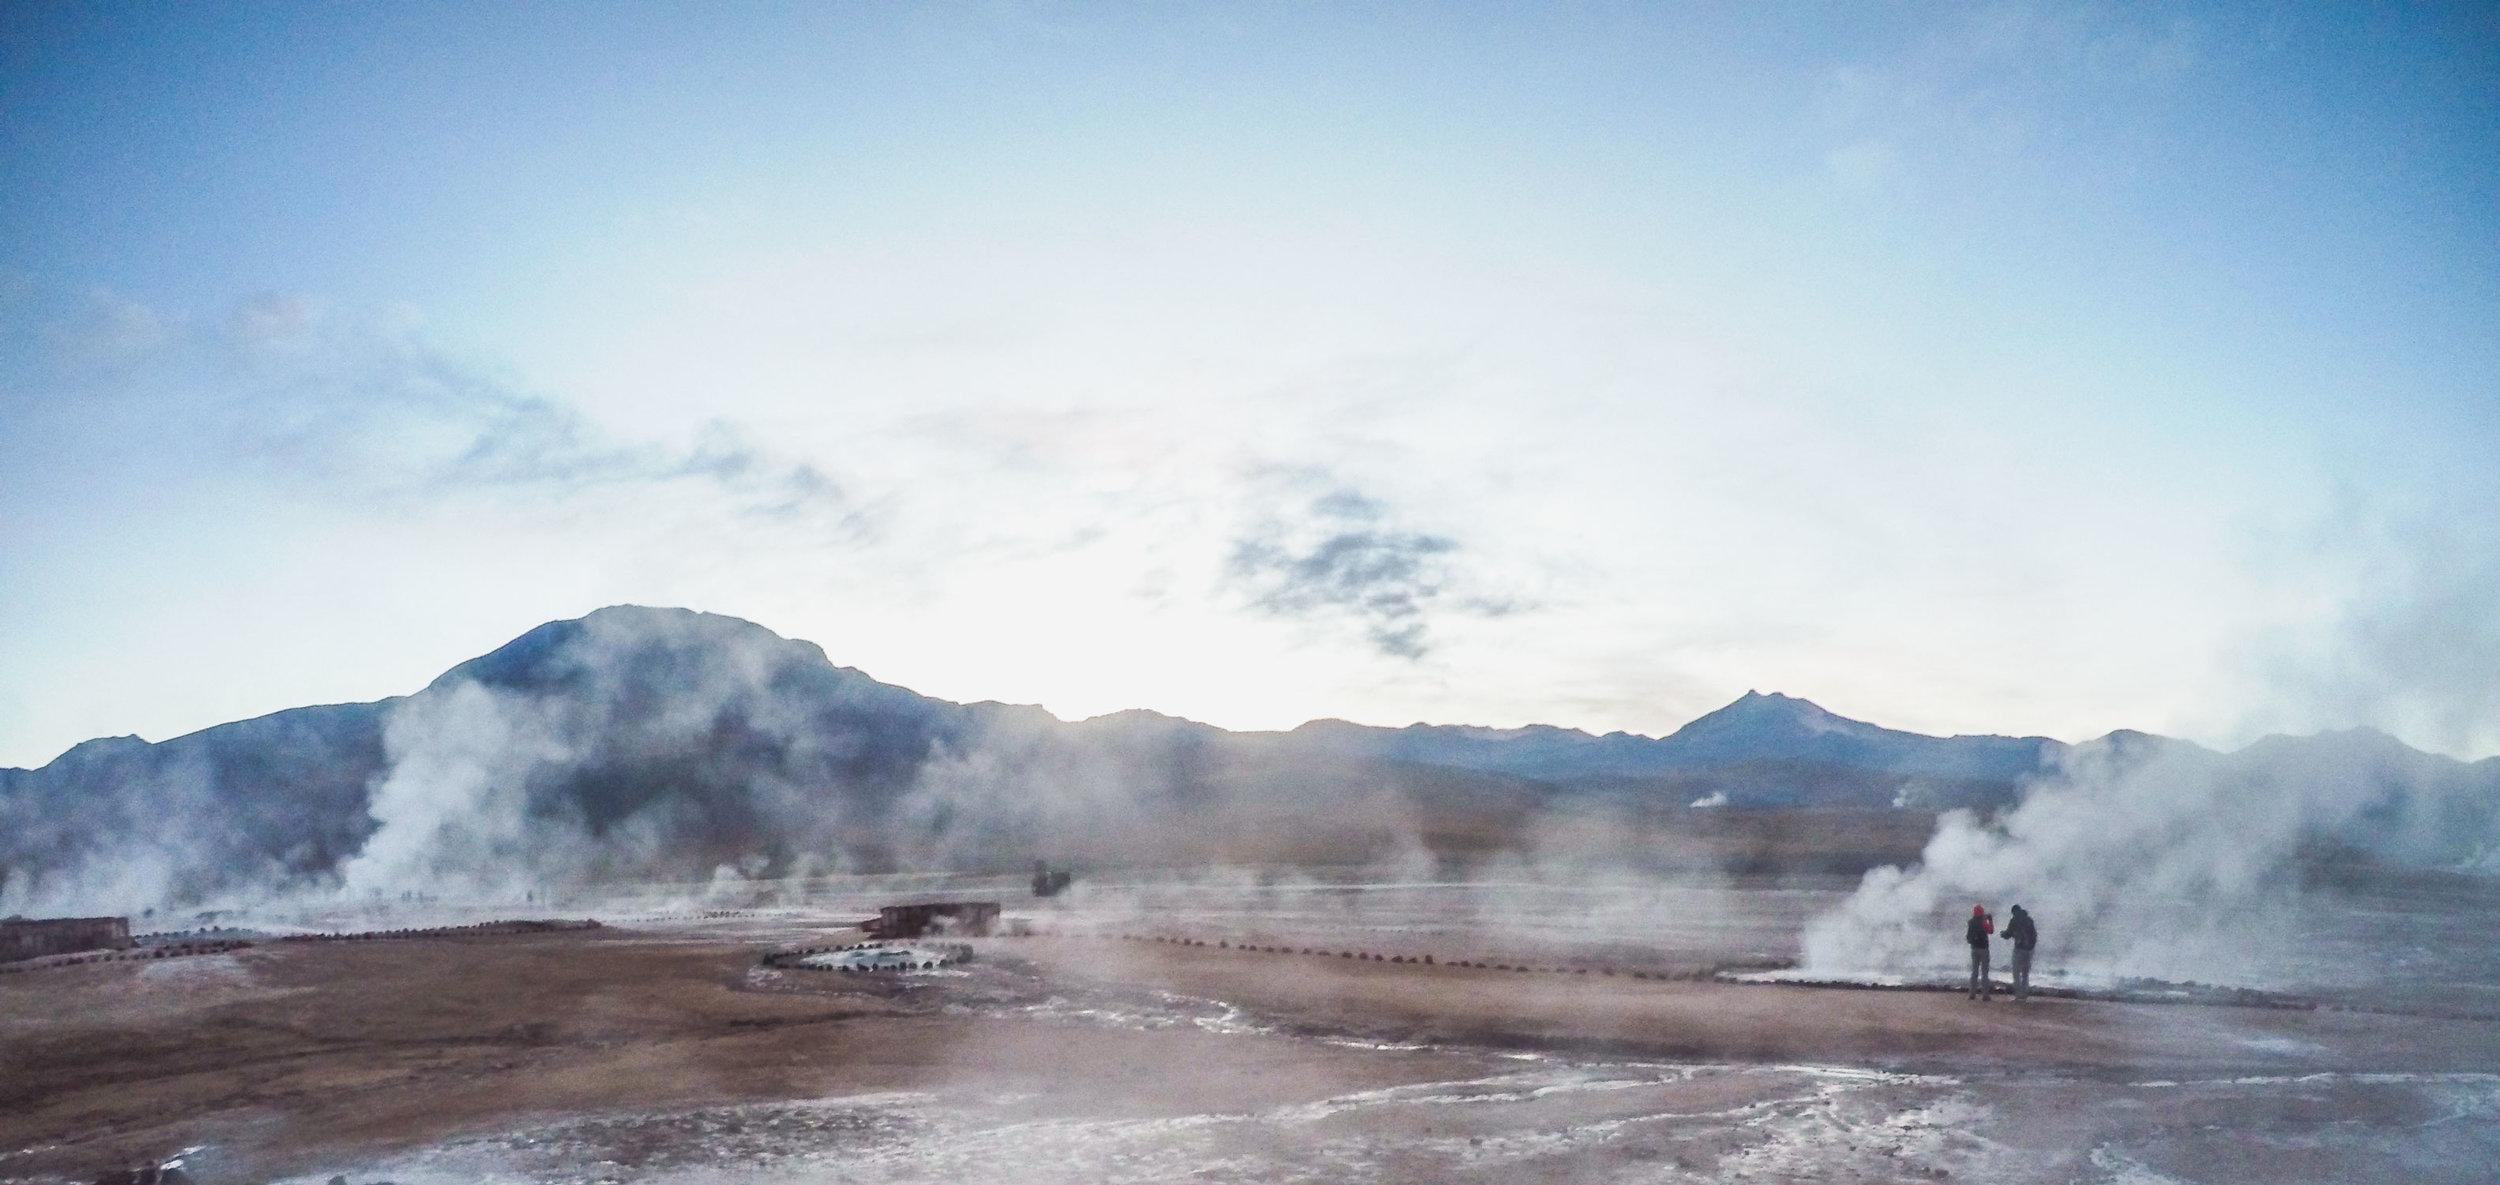 atacama-desert-chile-wander-south-el-tatio-geysers-6.jpg